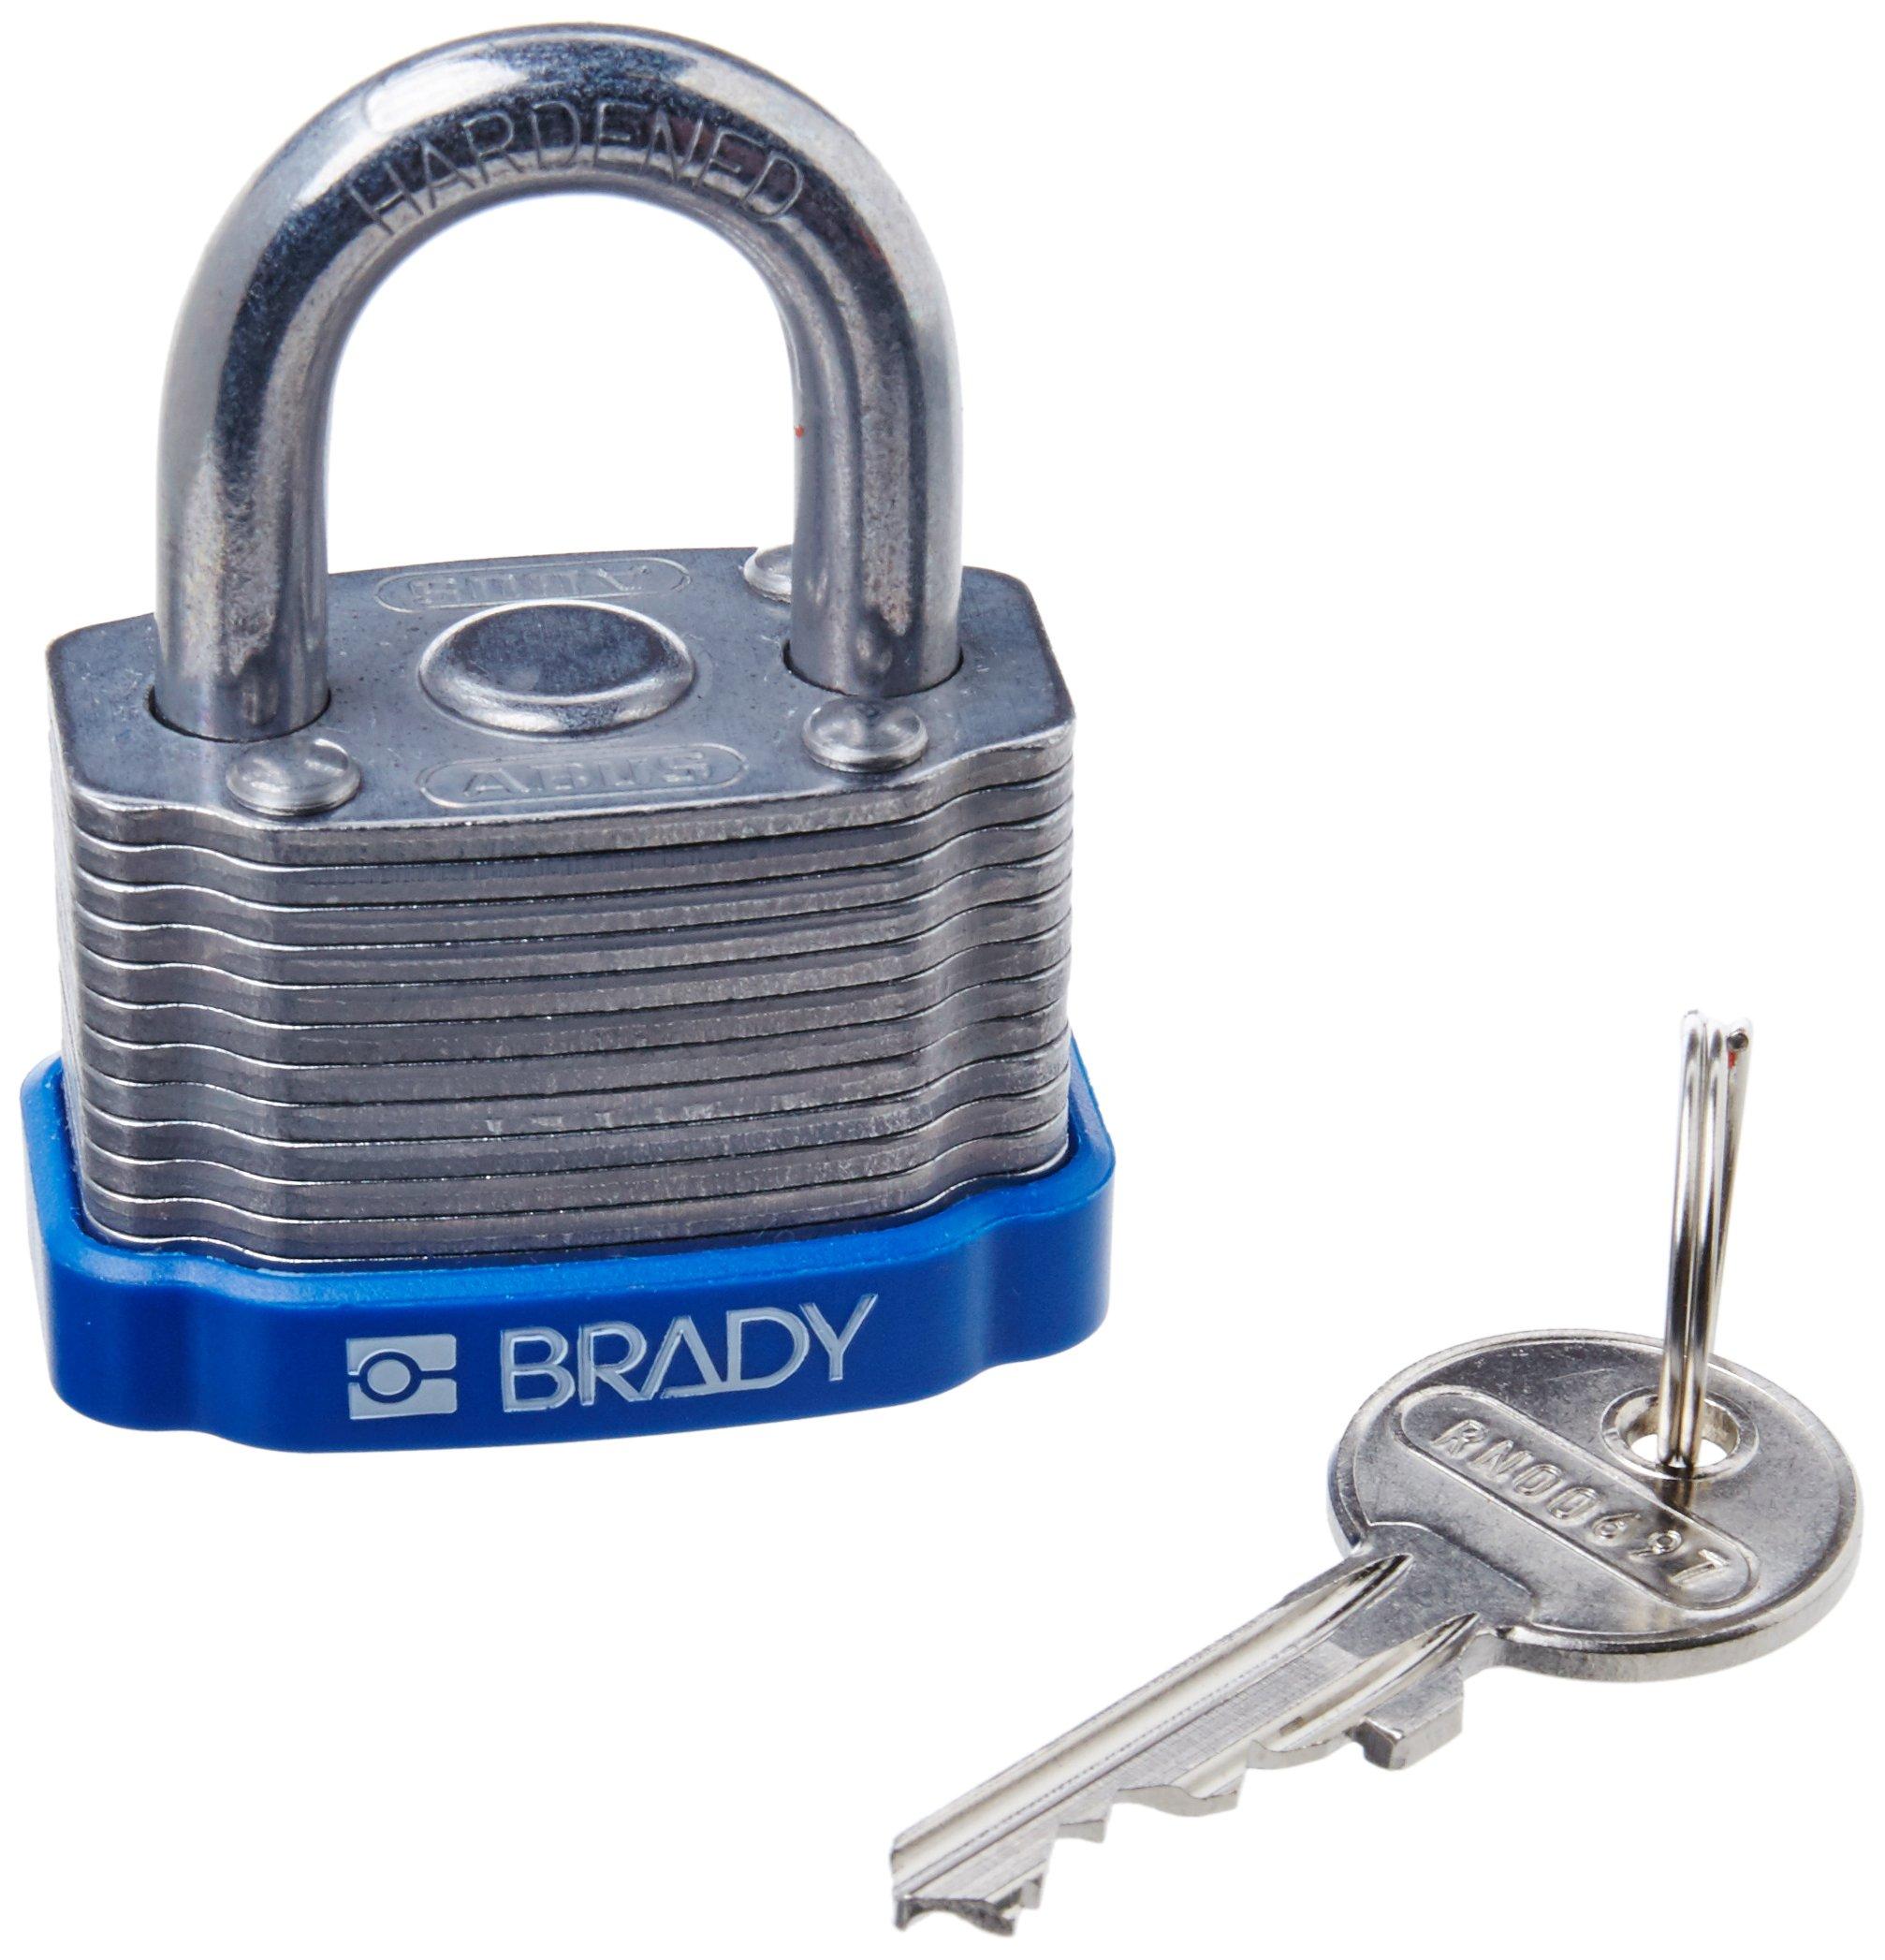 Brady 143130 Blue Key Retaining Steel Padlock, 1-1/5'' Height, 1-5/16'' Width, Blue